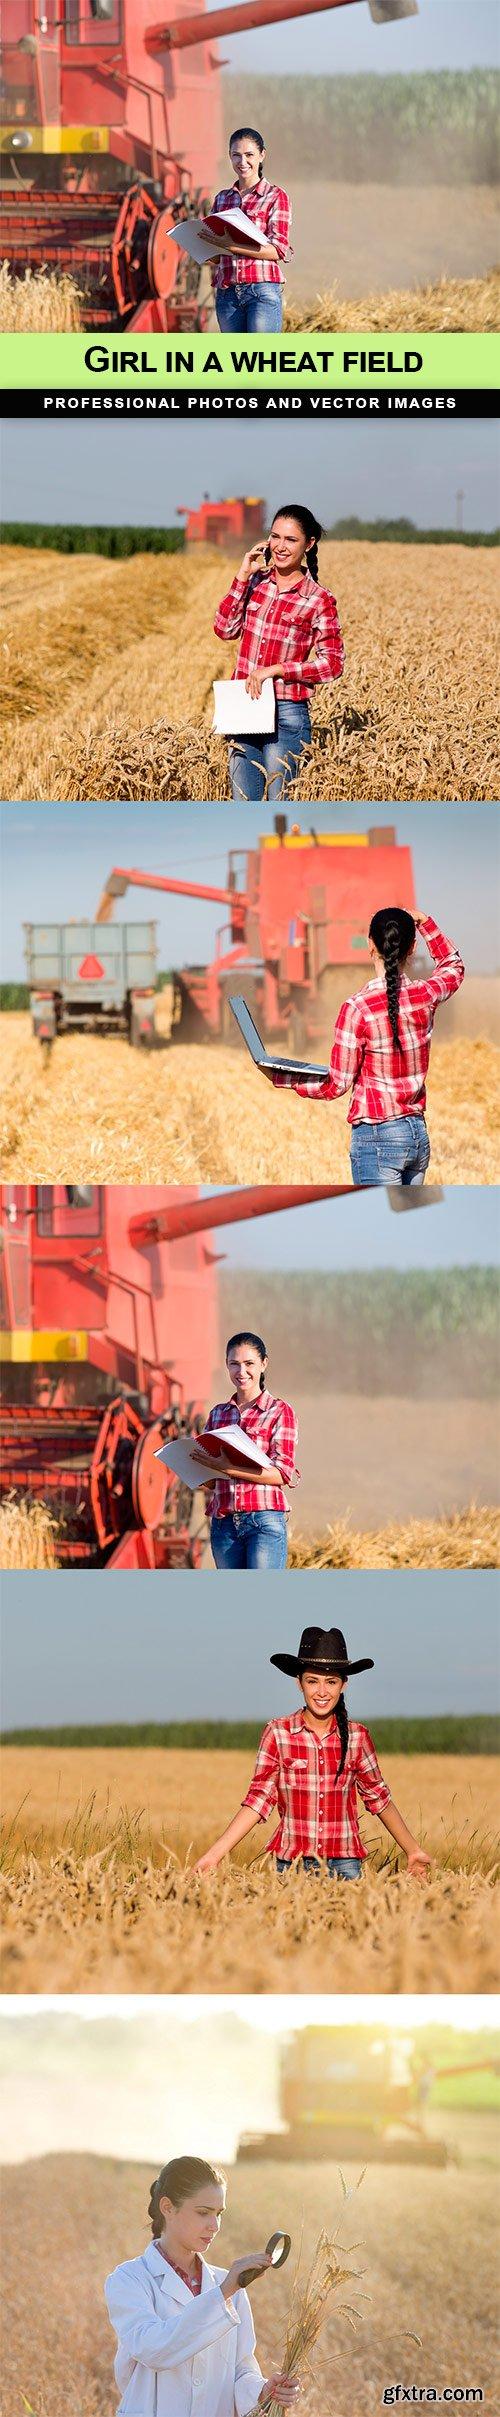 Girl in a wheat field - 5 UHQ JPEG